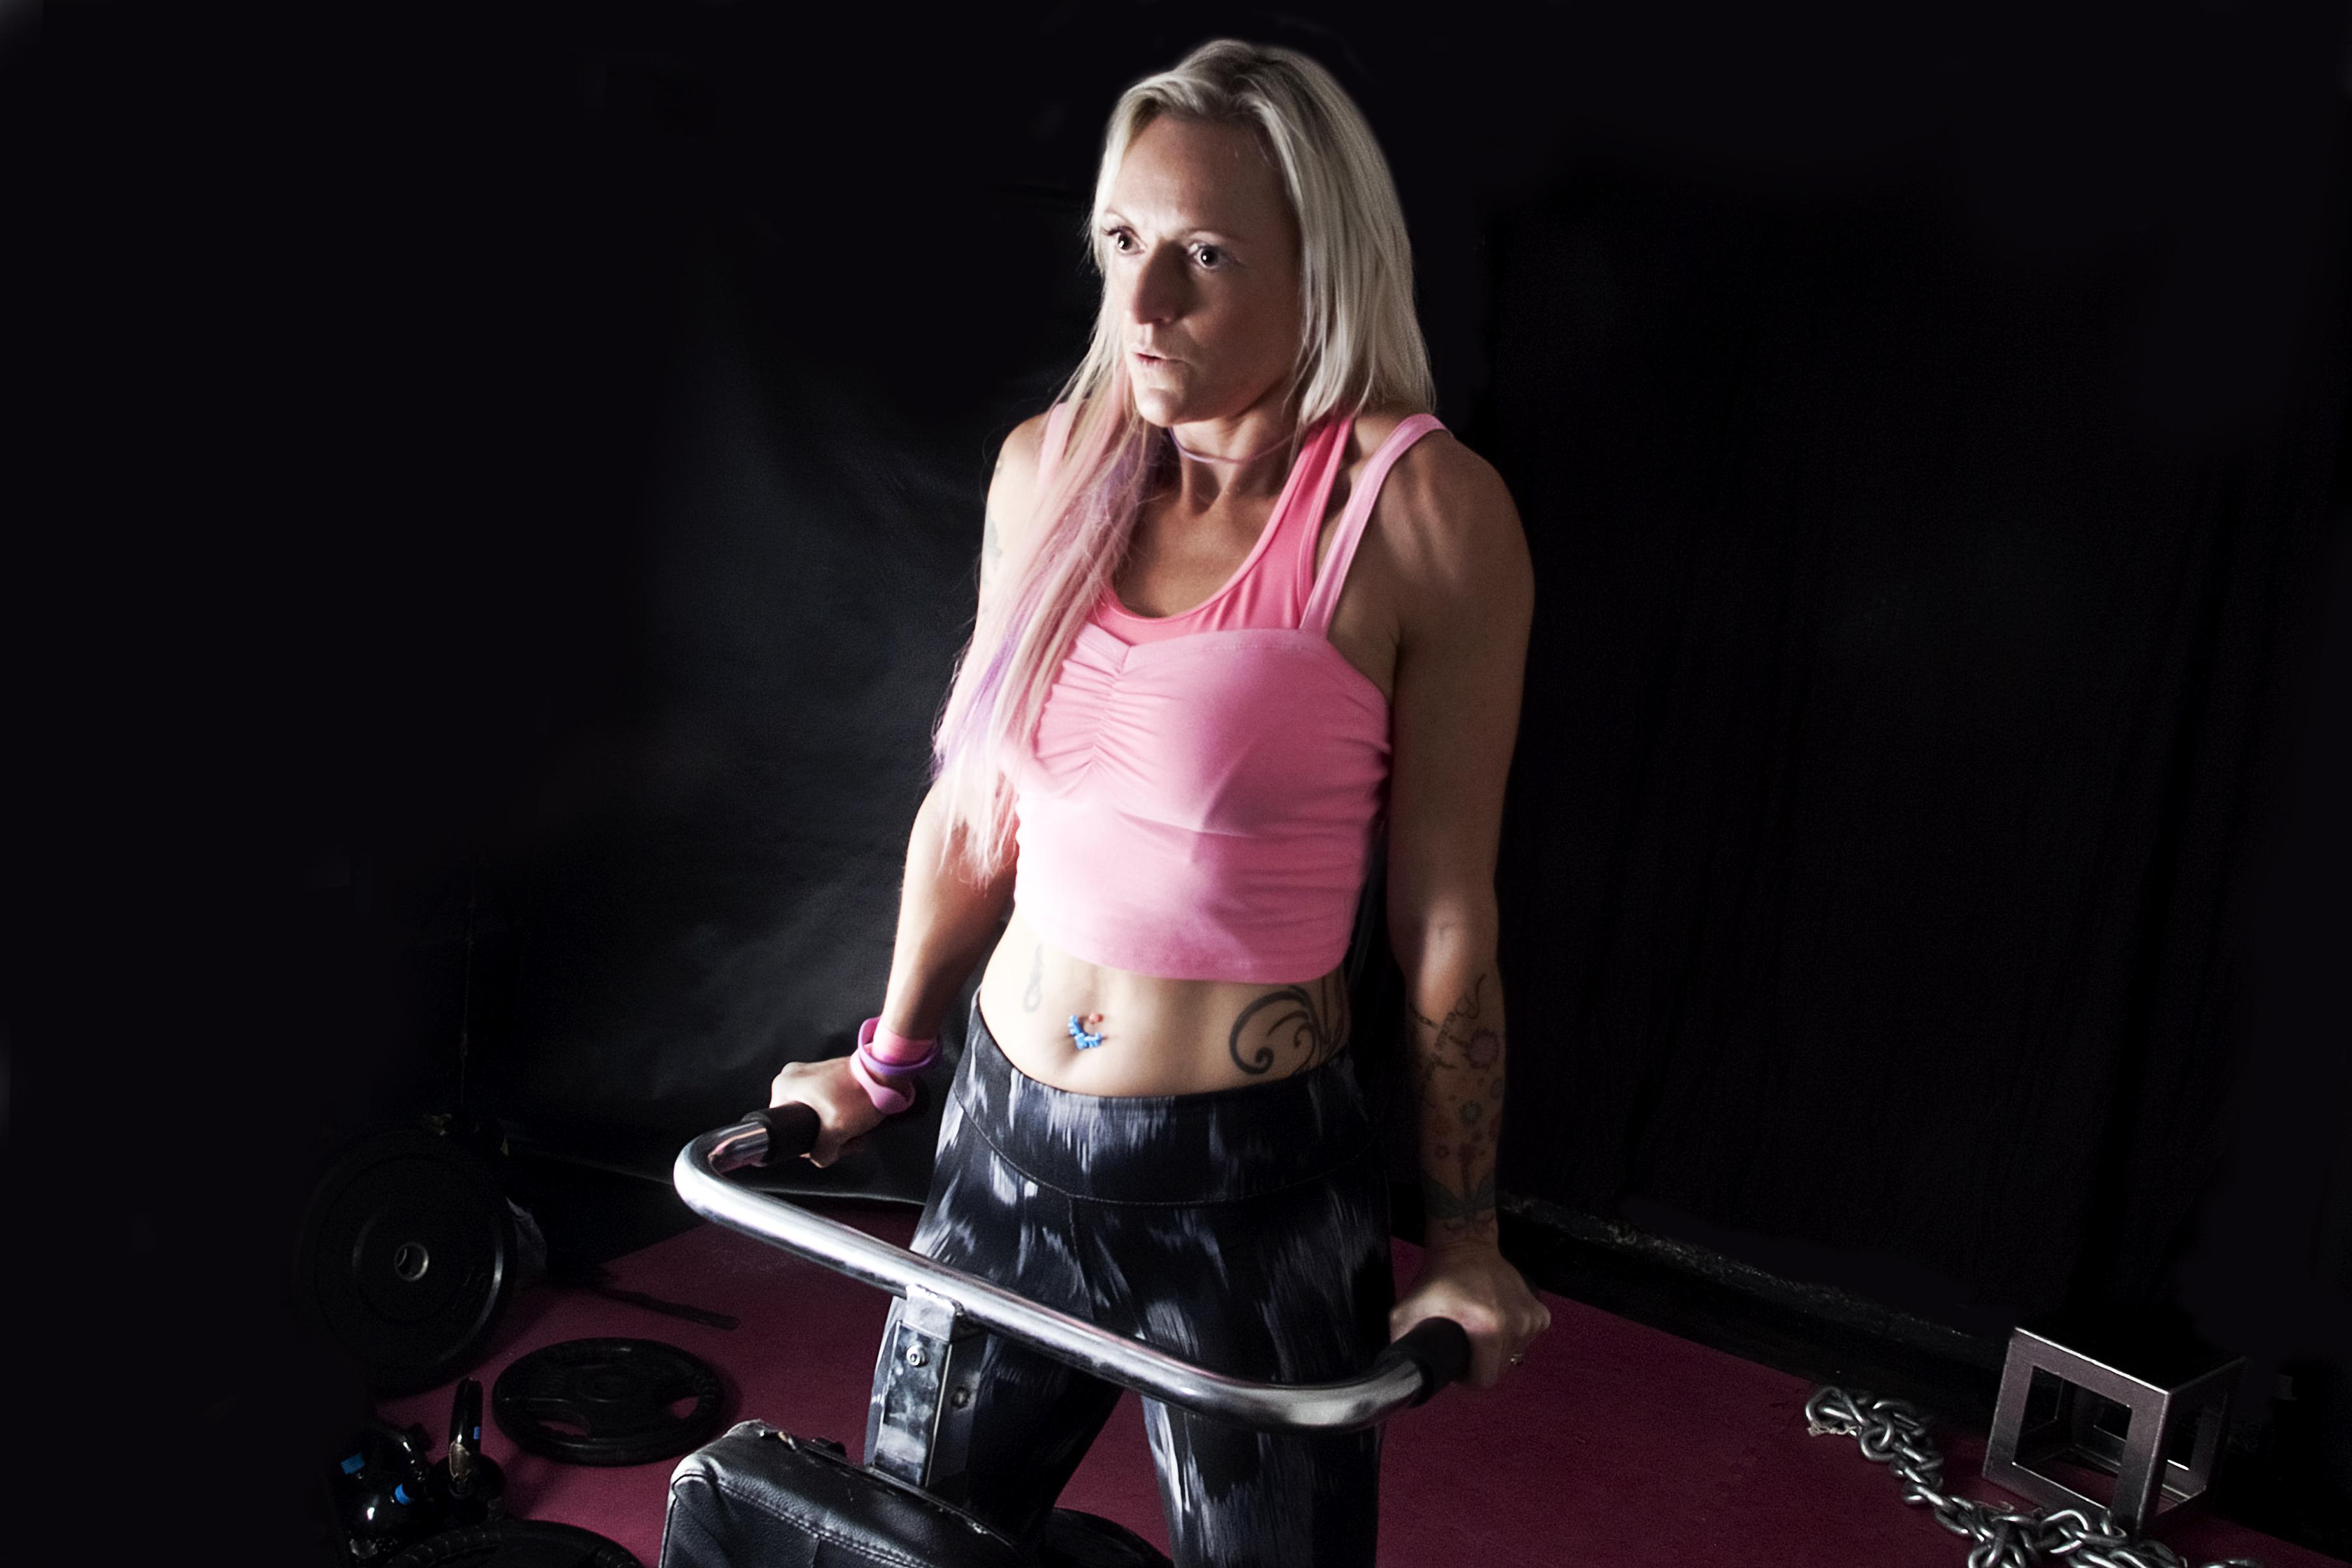 AMRAP Kettlebell workouts